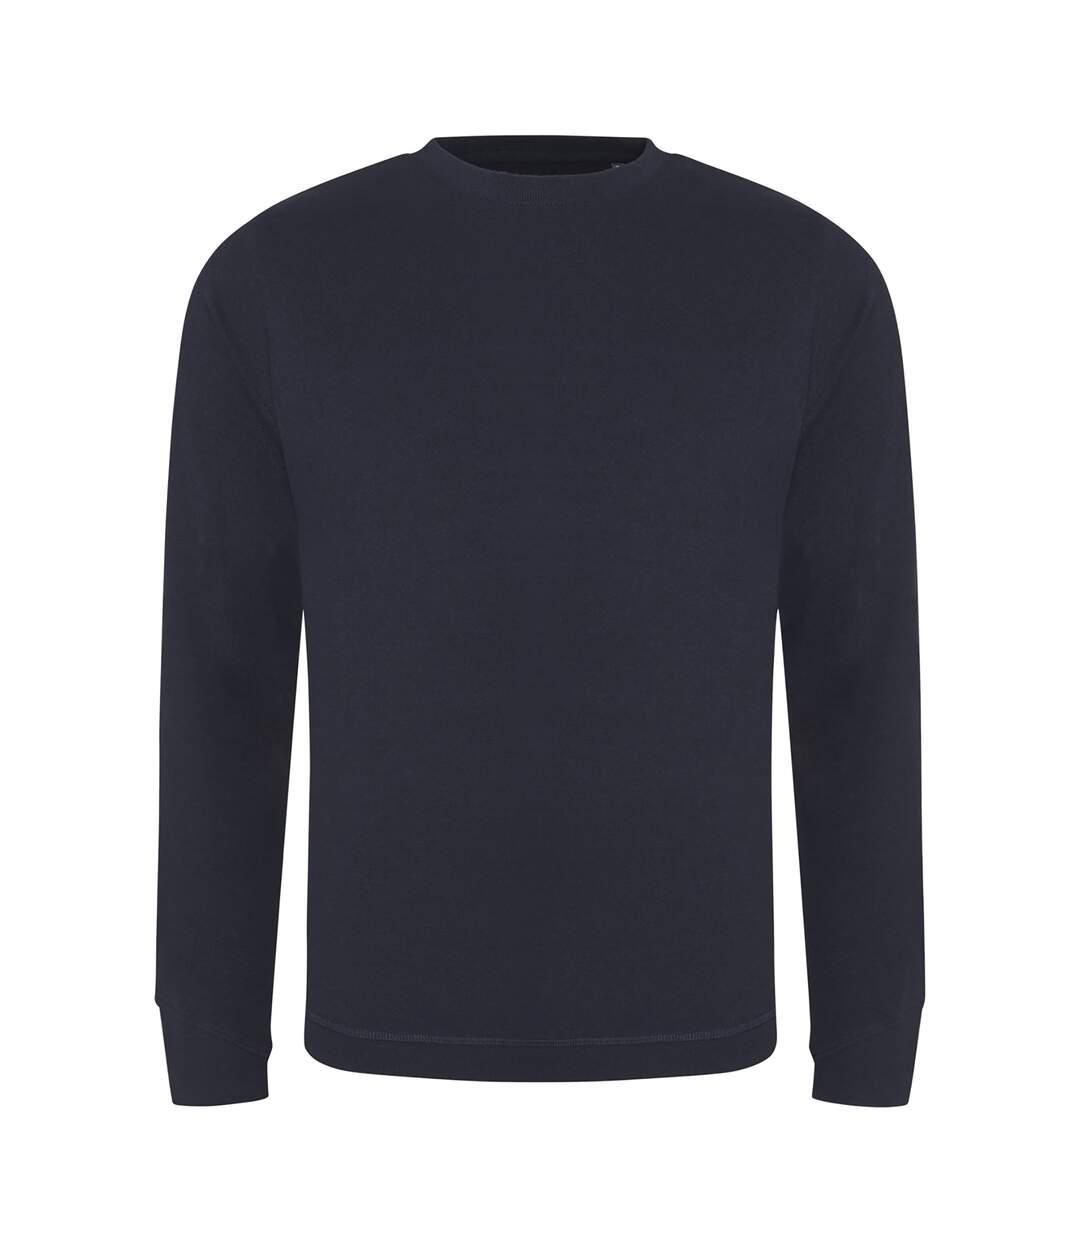 Ecologie Mens Banff Sweatshirt (Navy) - UTPC3193